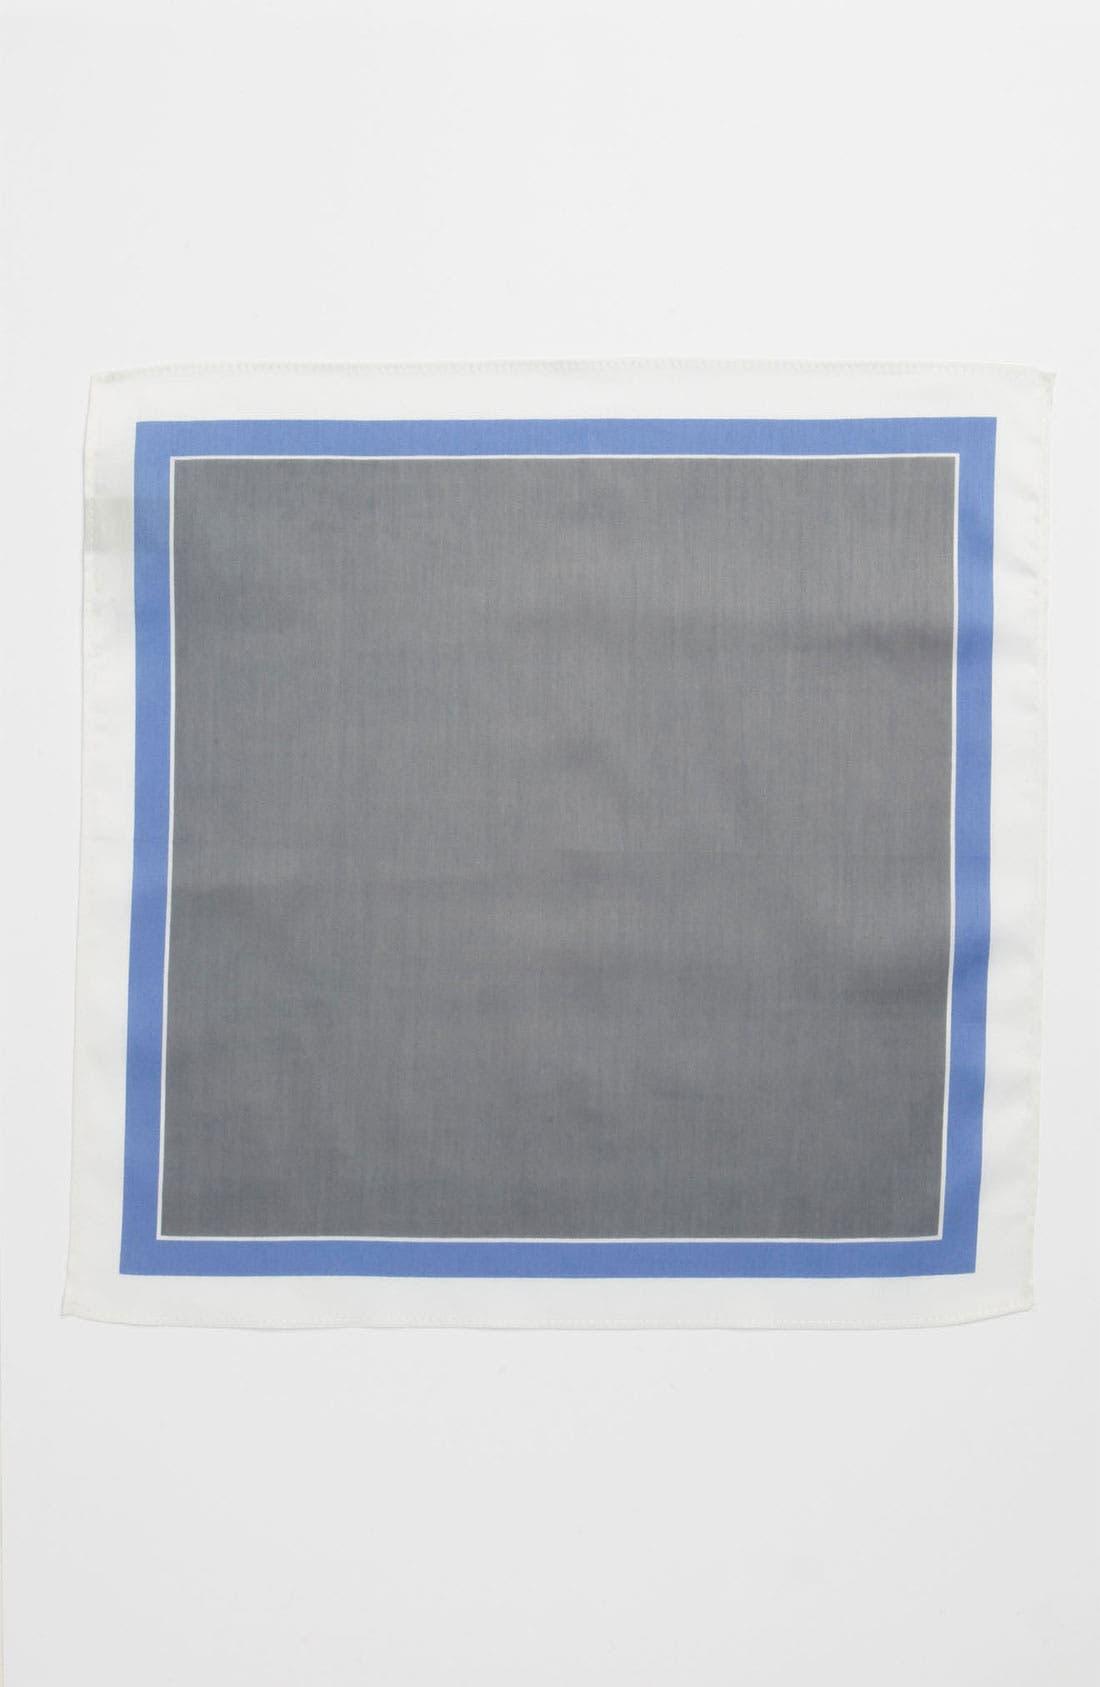 Alternate Image 2  - Michael Kors Border Pocket Square